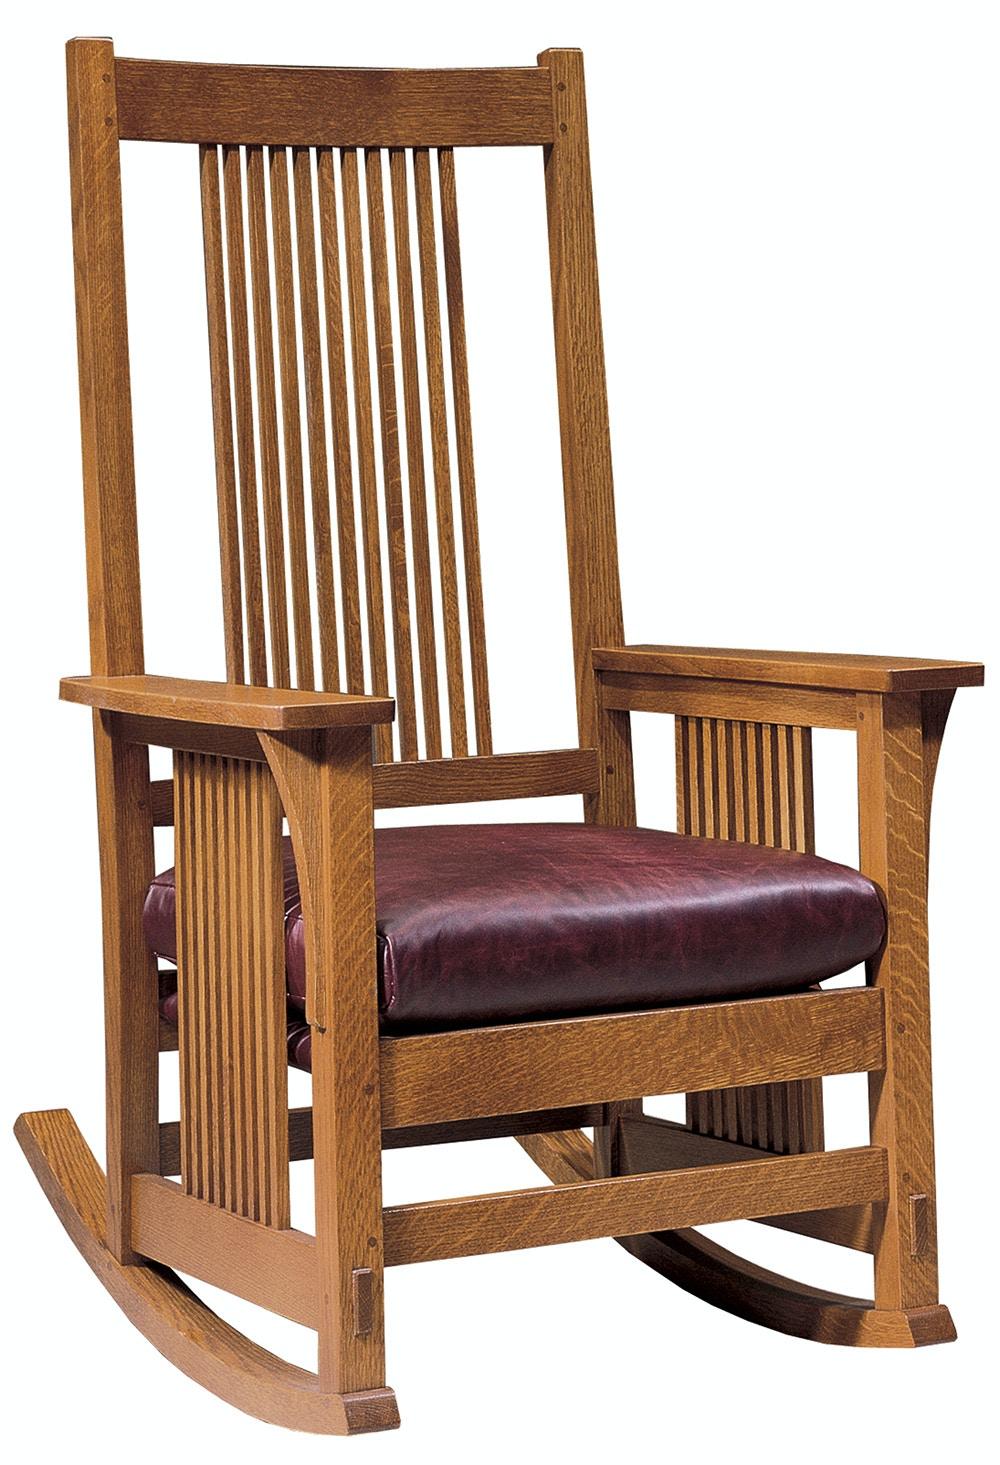 Stickley Furniture Living Room Spindle Rocker 89 376 R At INTERIORS HOME